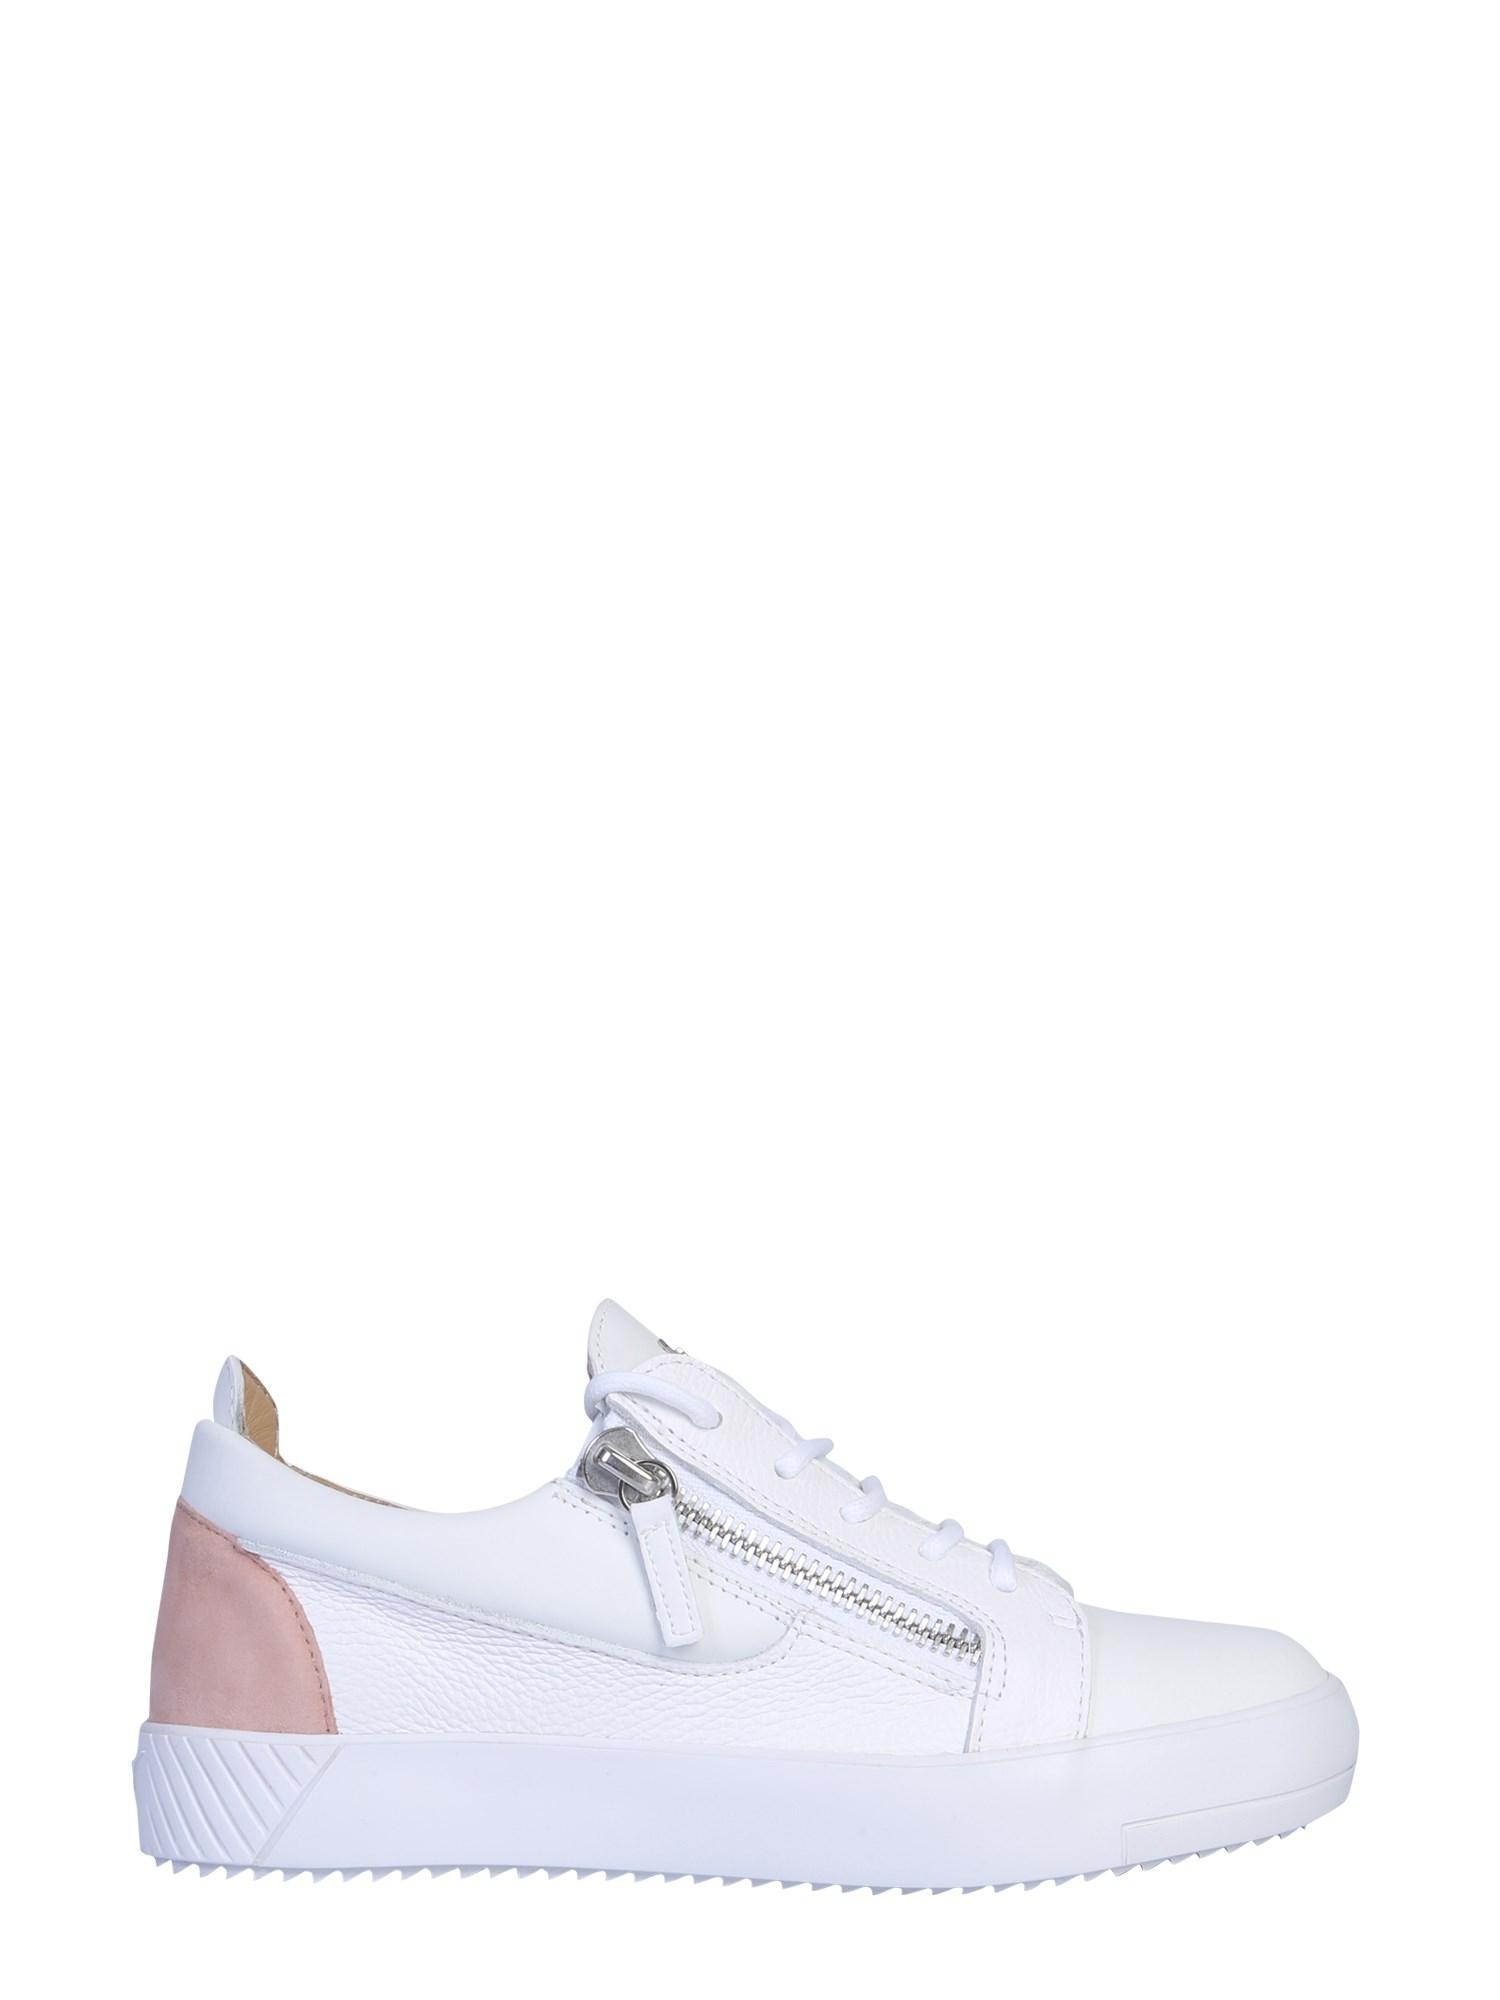 Giuseppe zanotti leather sneaker - giuseppe zanotti - Modalova